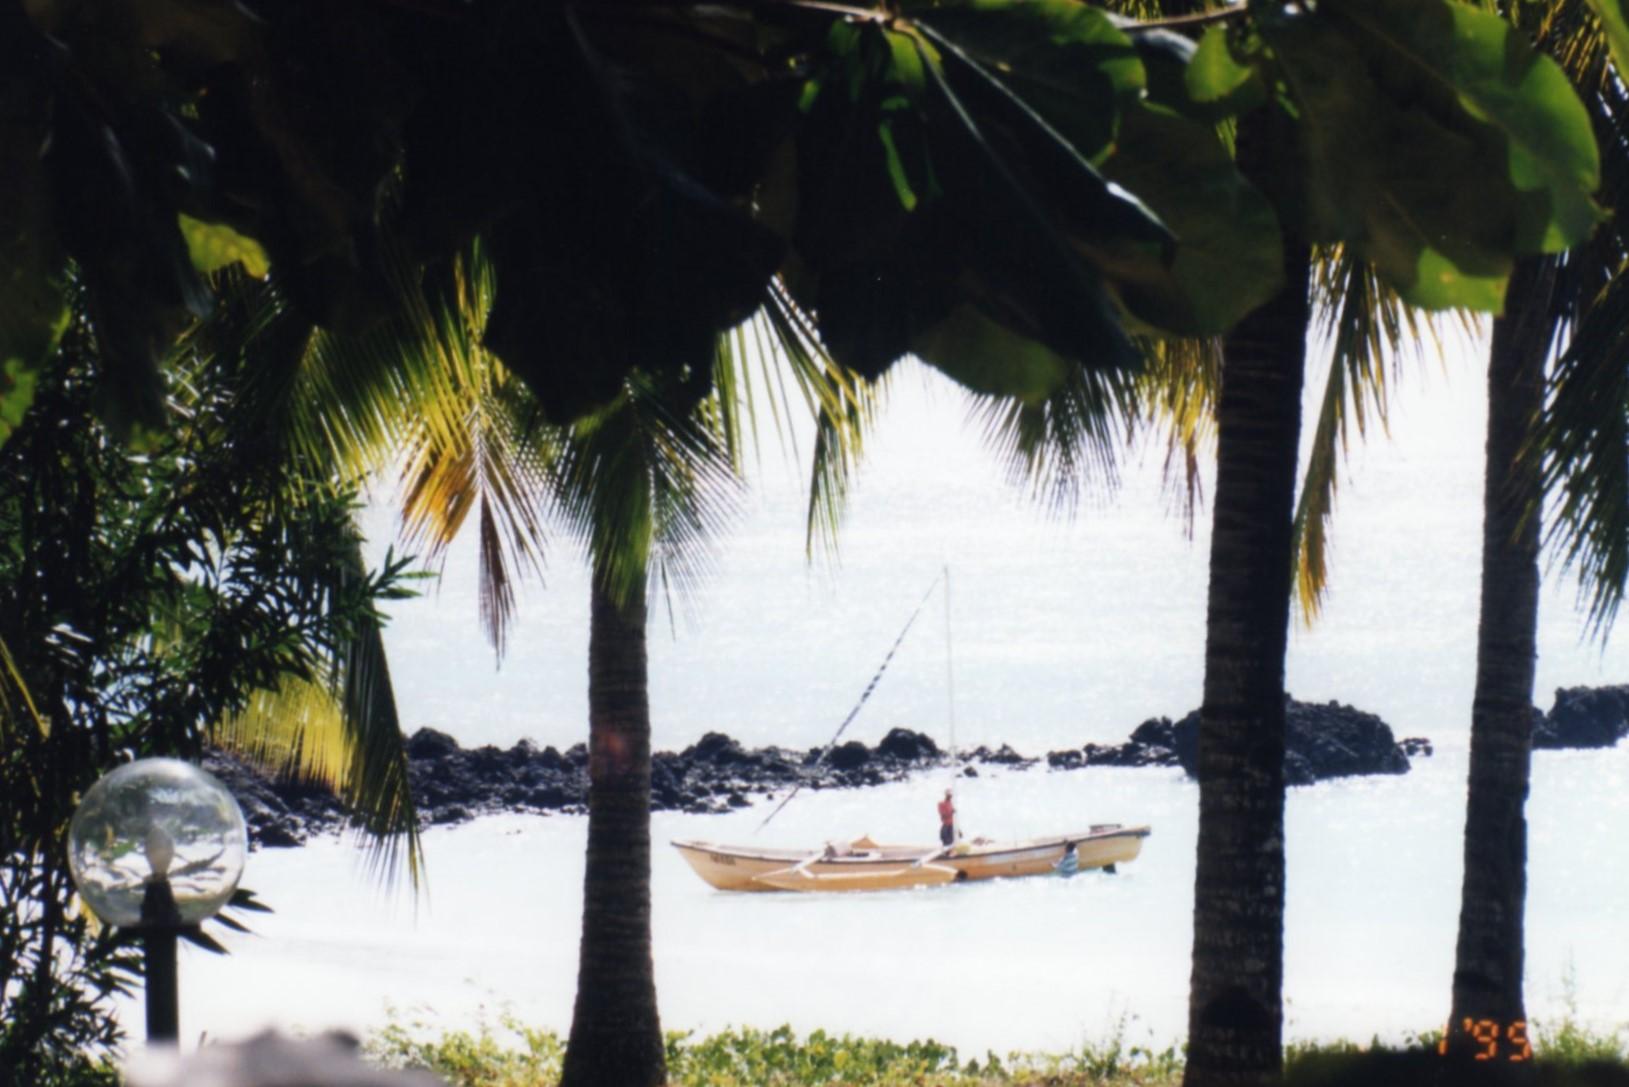 Pirogue through the palm trees